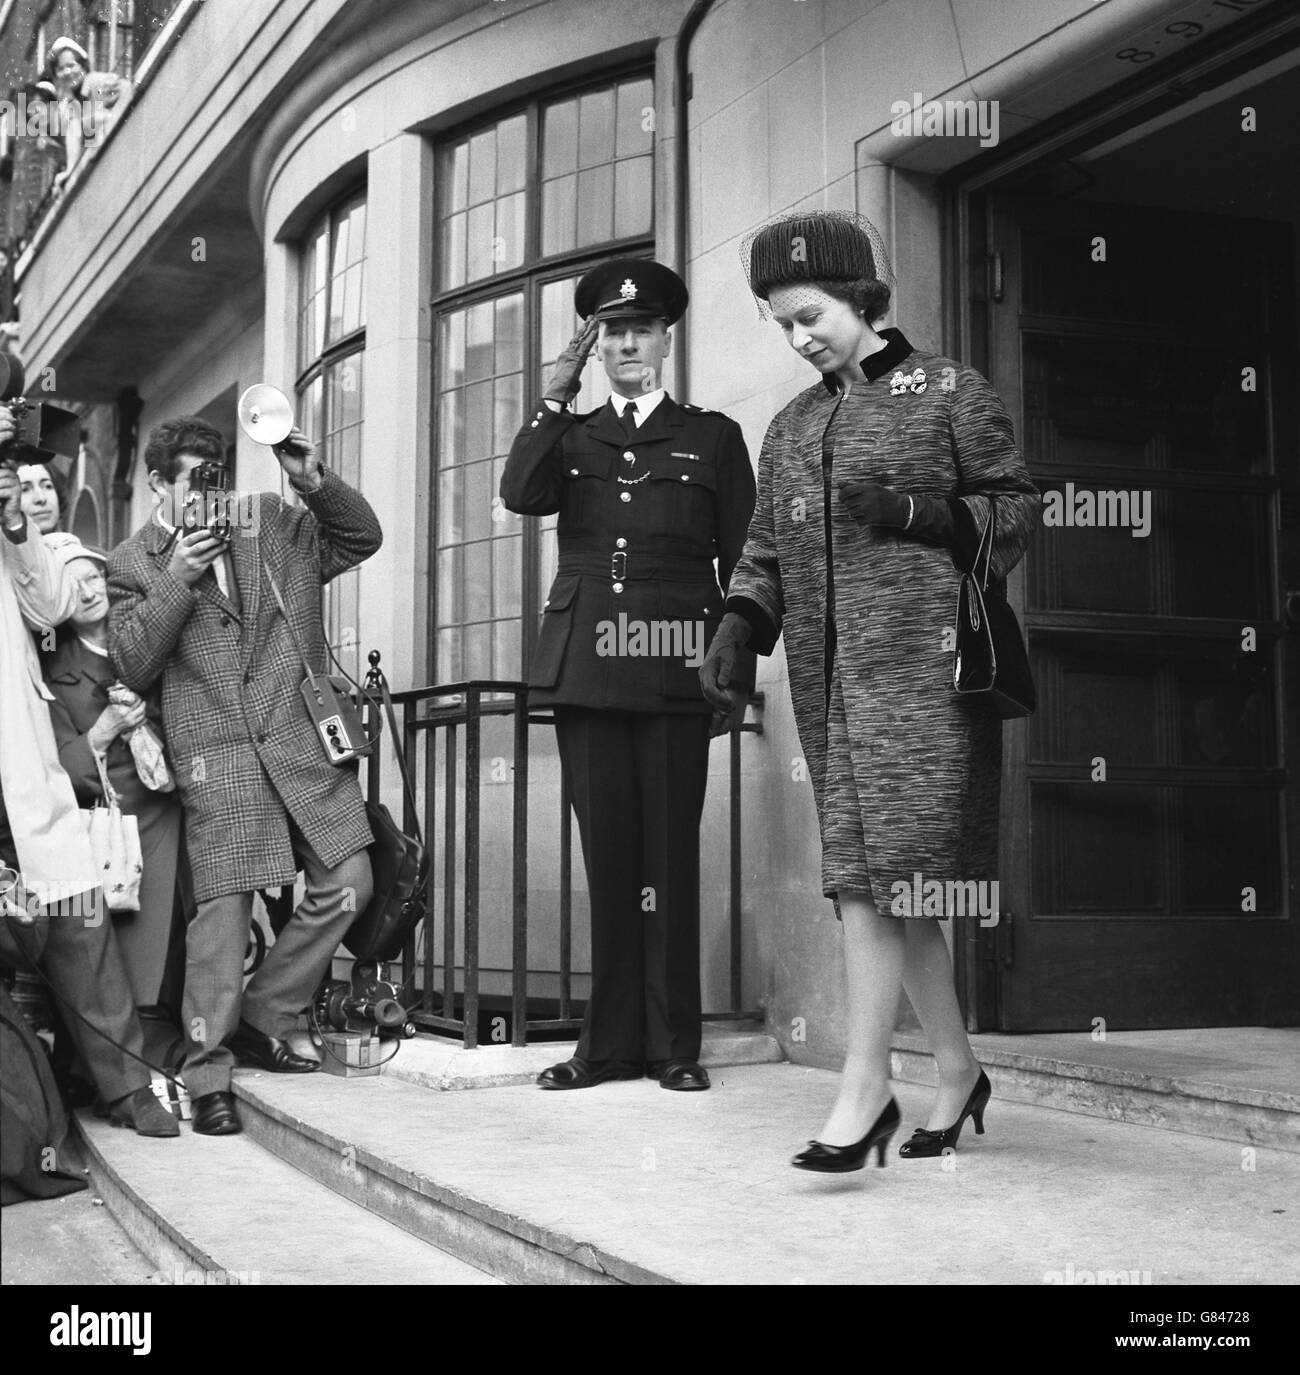 Royalty - Queen Elizabeth II - King Edward VII Hospital, Marylebone - Stock Image